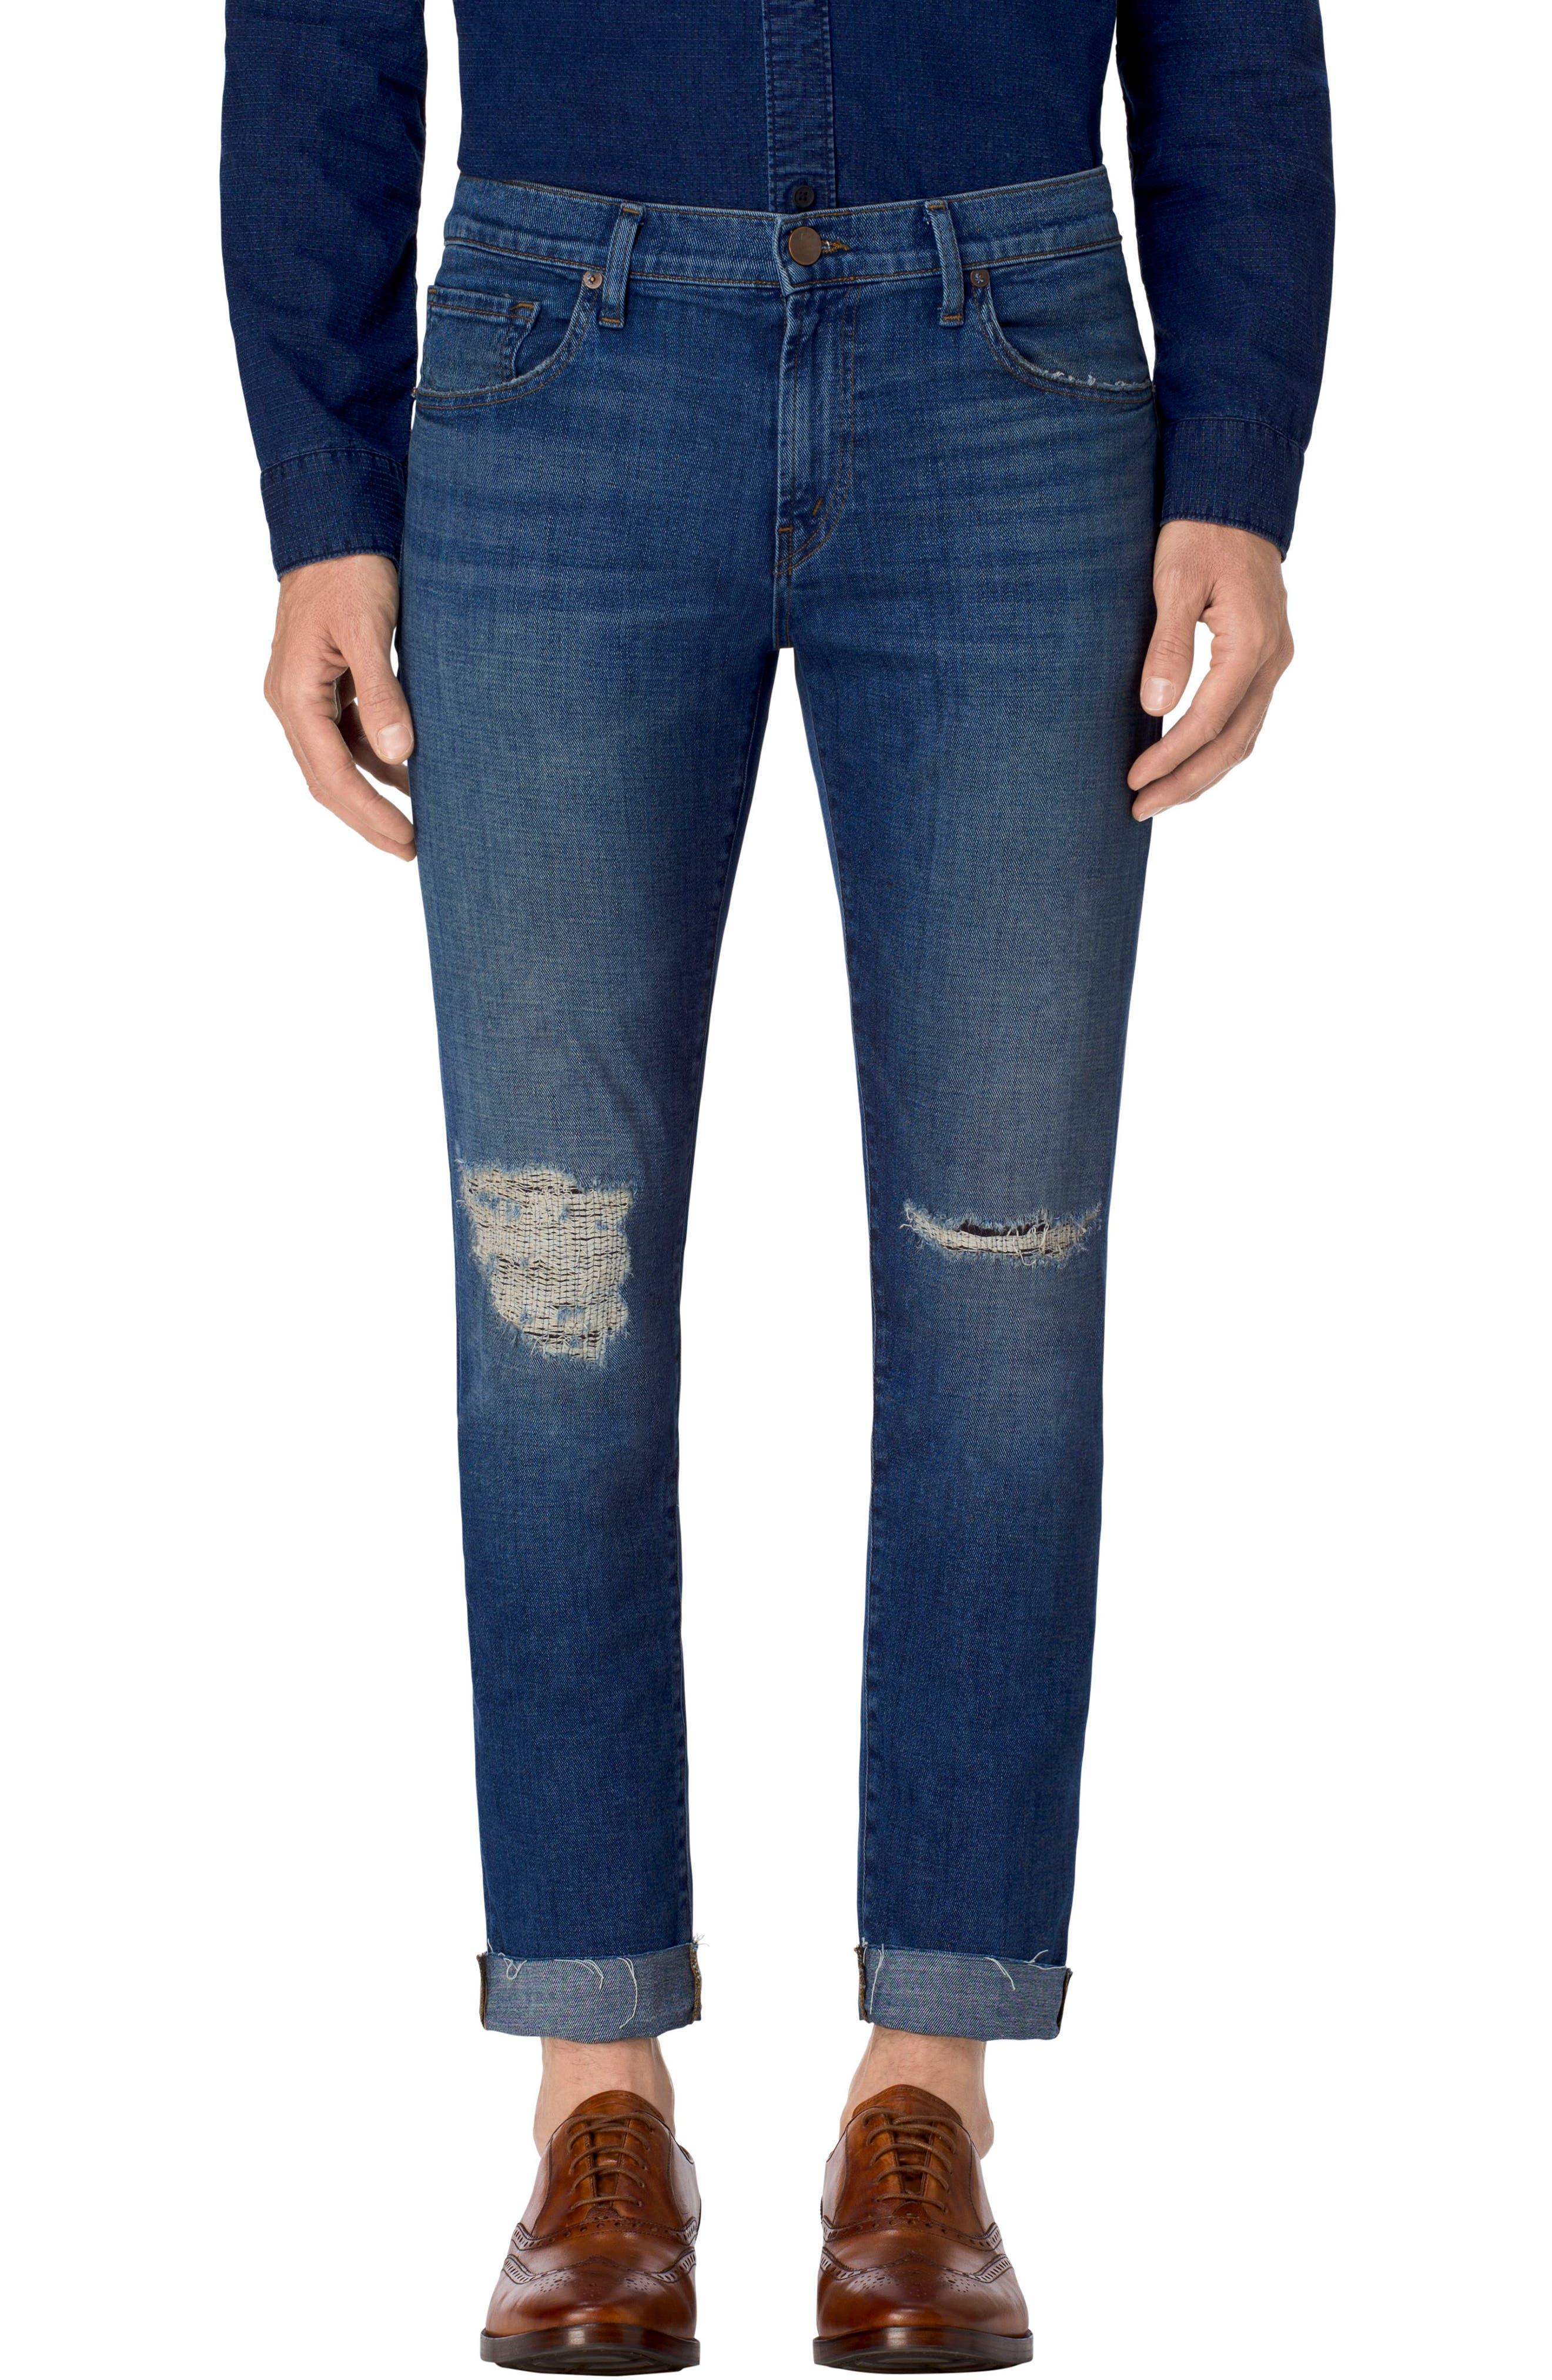 Alternate Image 1 Selected - J Brand Tyler Slim Fit Jeans (Experiment)